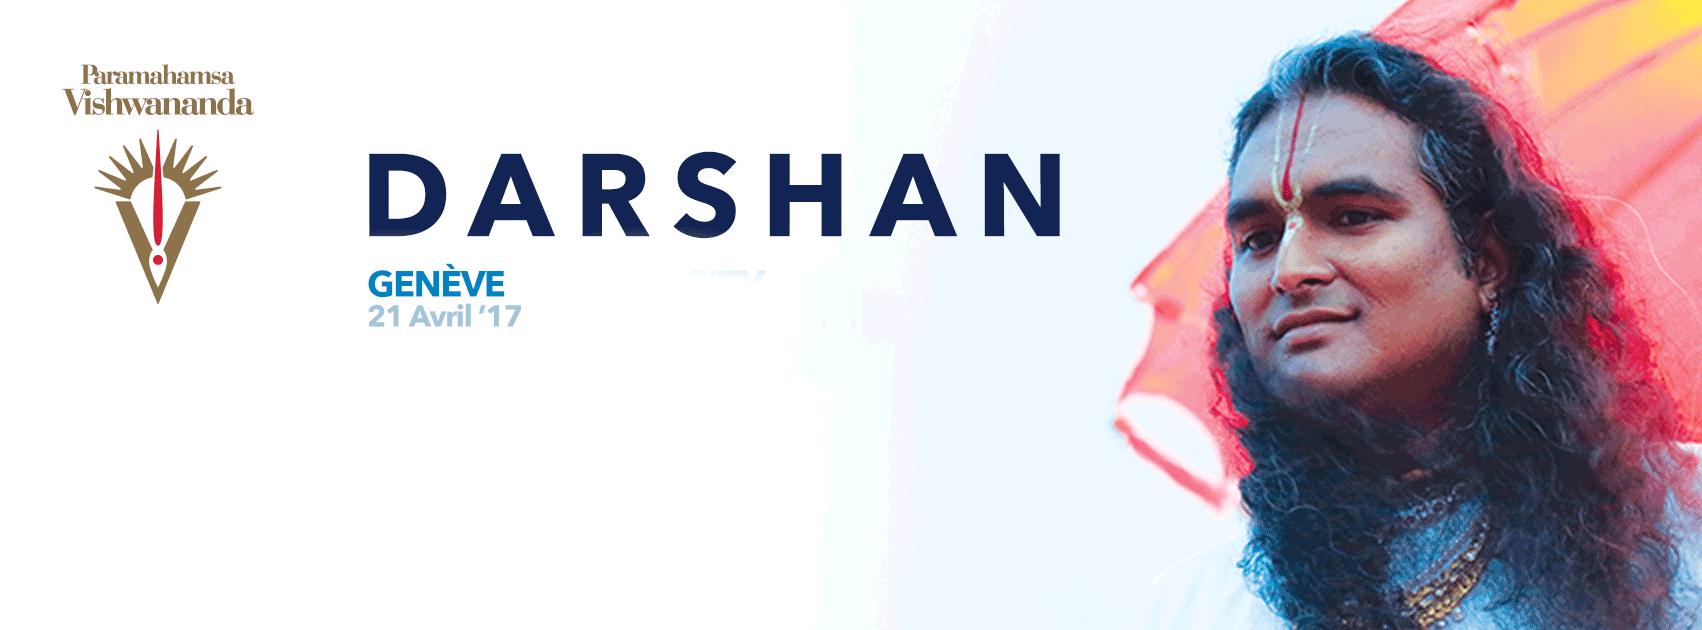 Darshan F Web